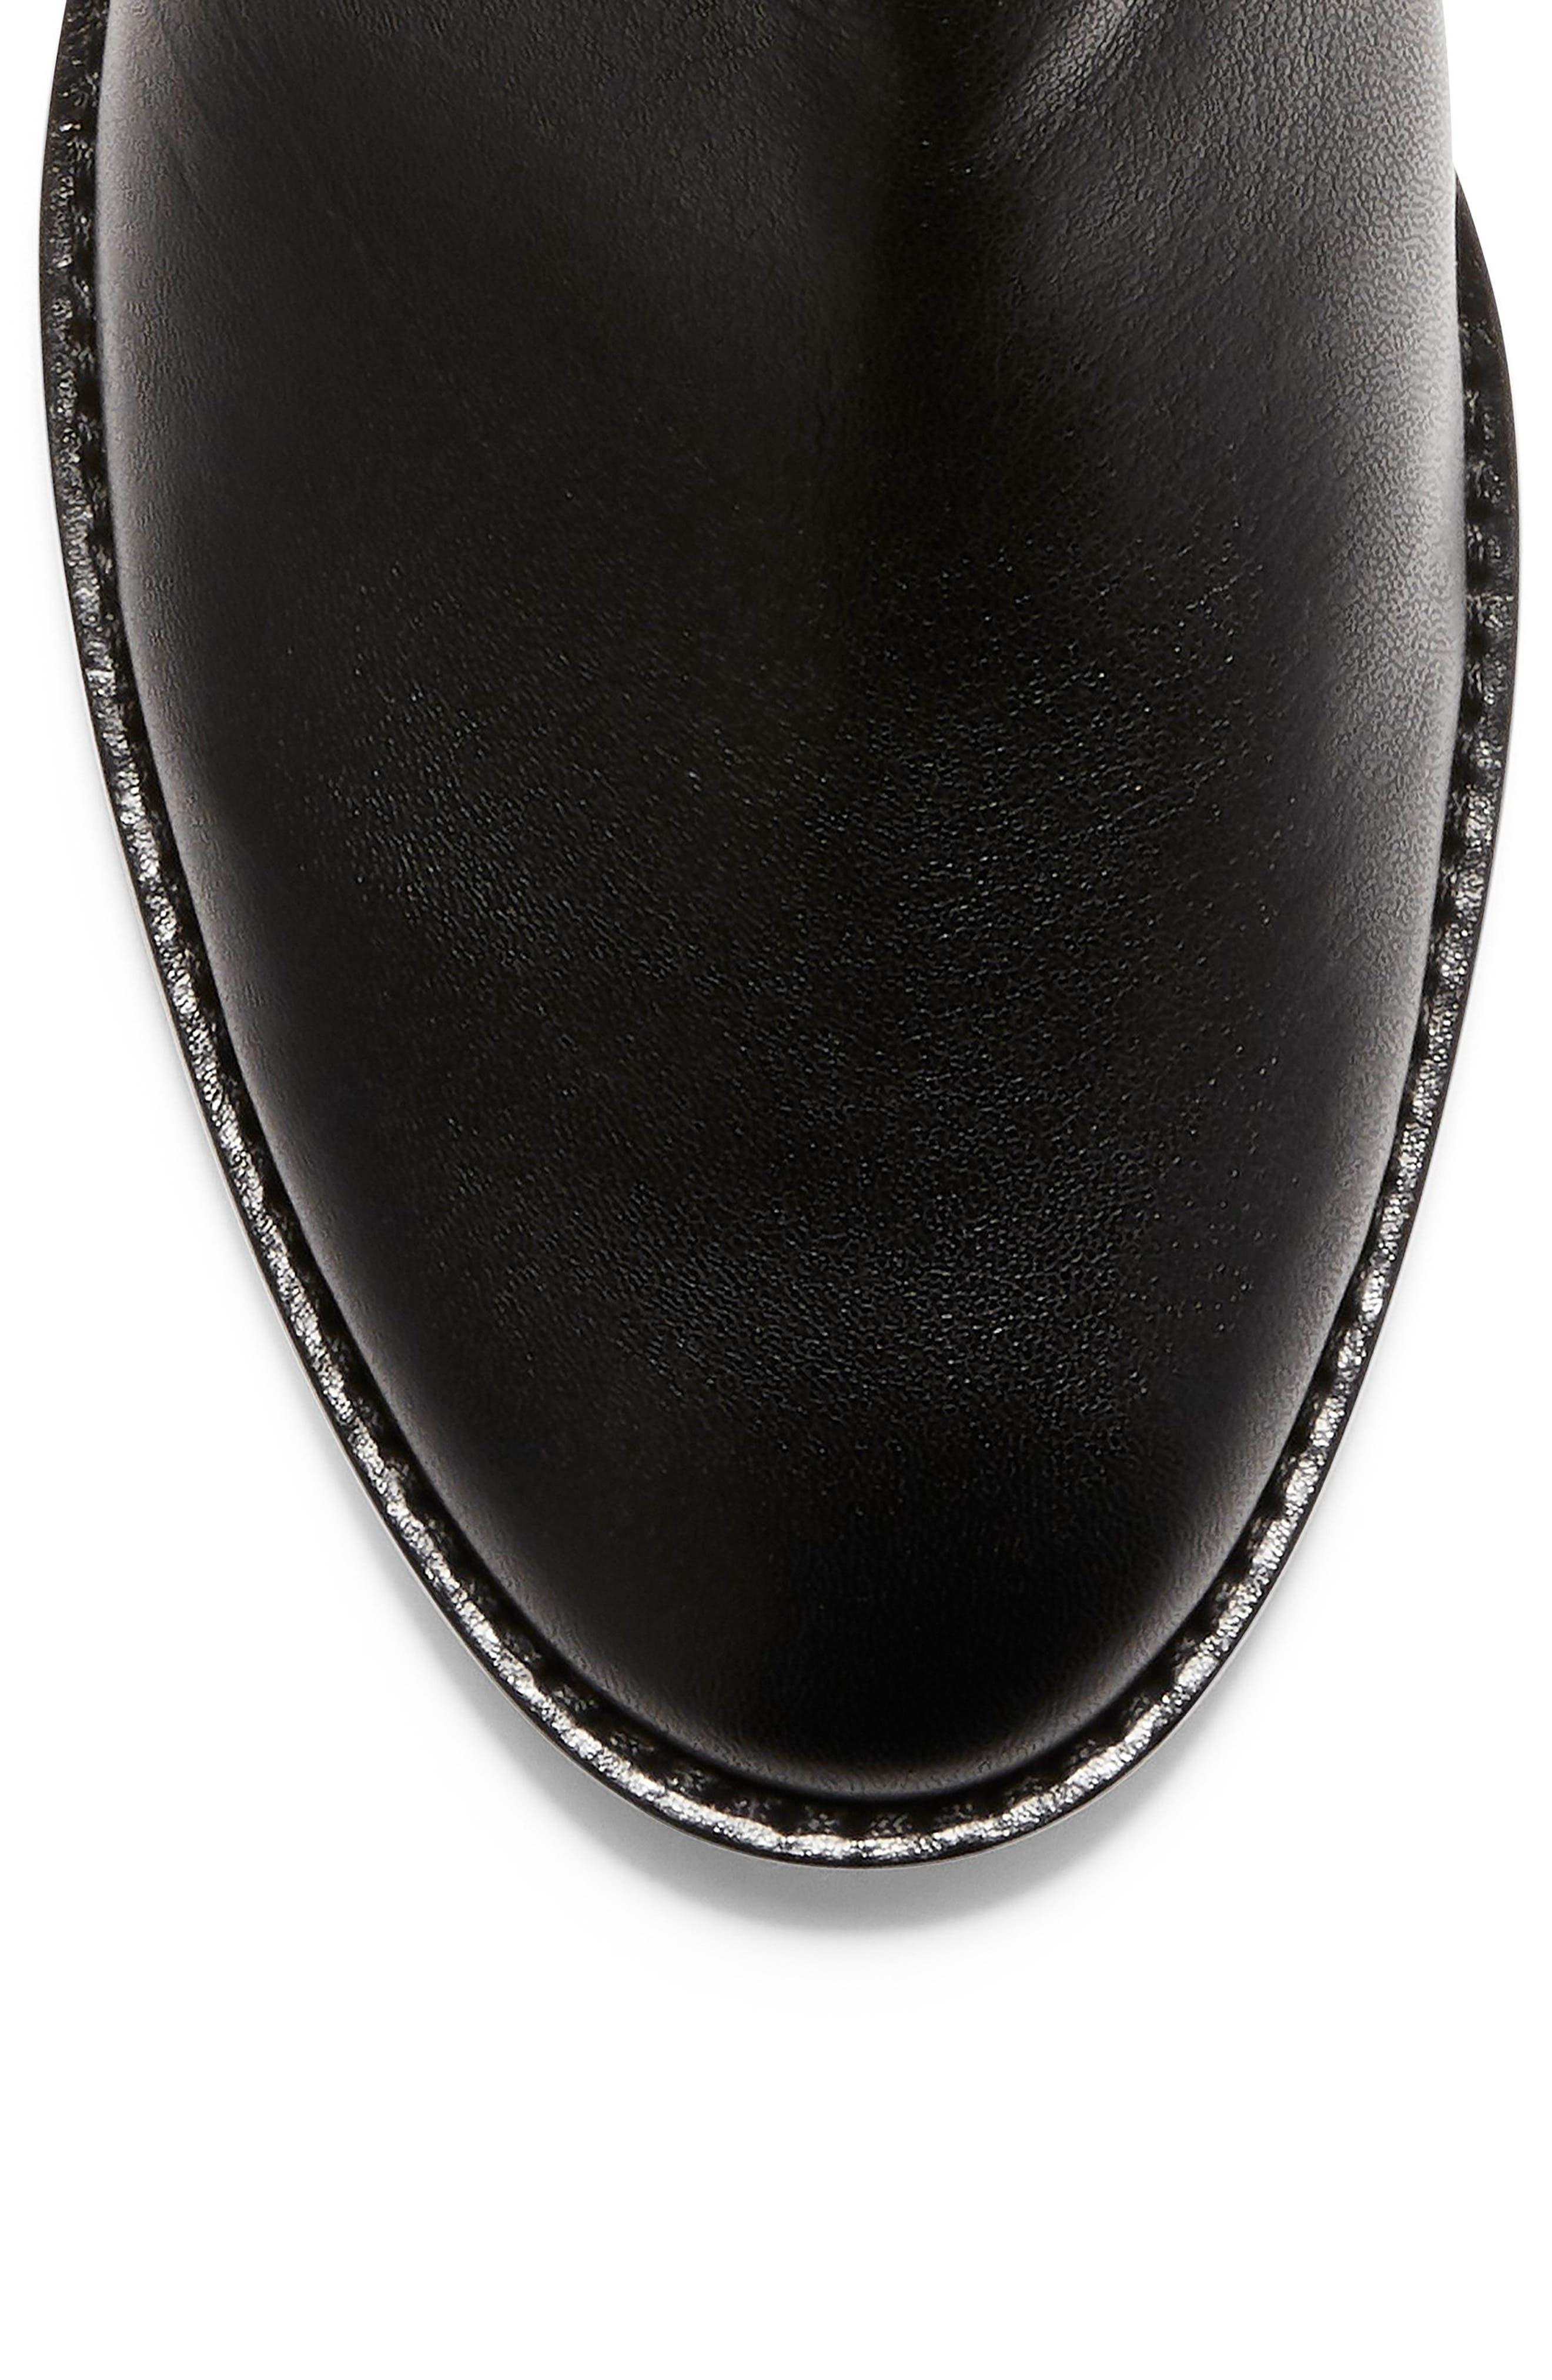 Harrington Grand Slouch Bootie,                             Alternate thumbnail 7, color,                             BLACK LEATHER